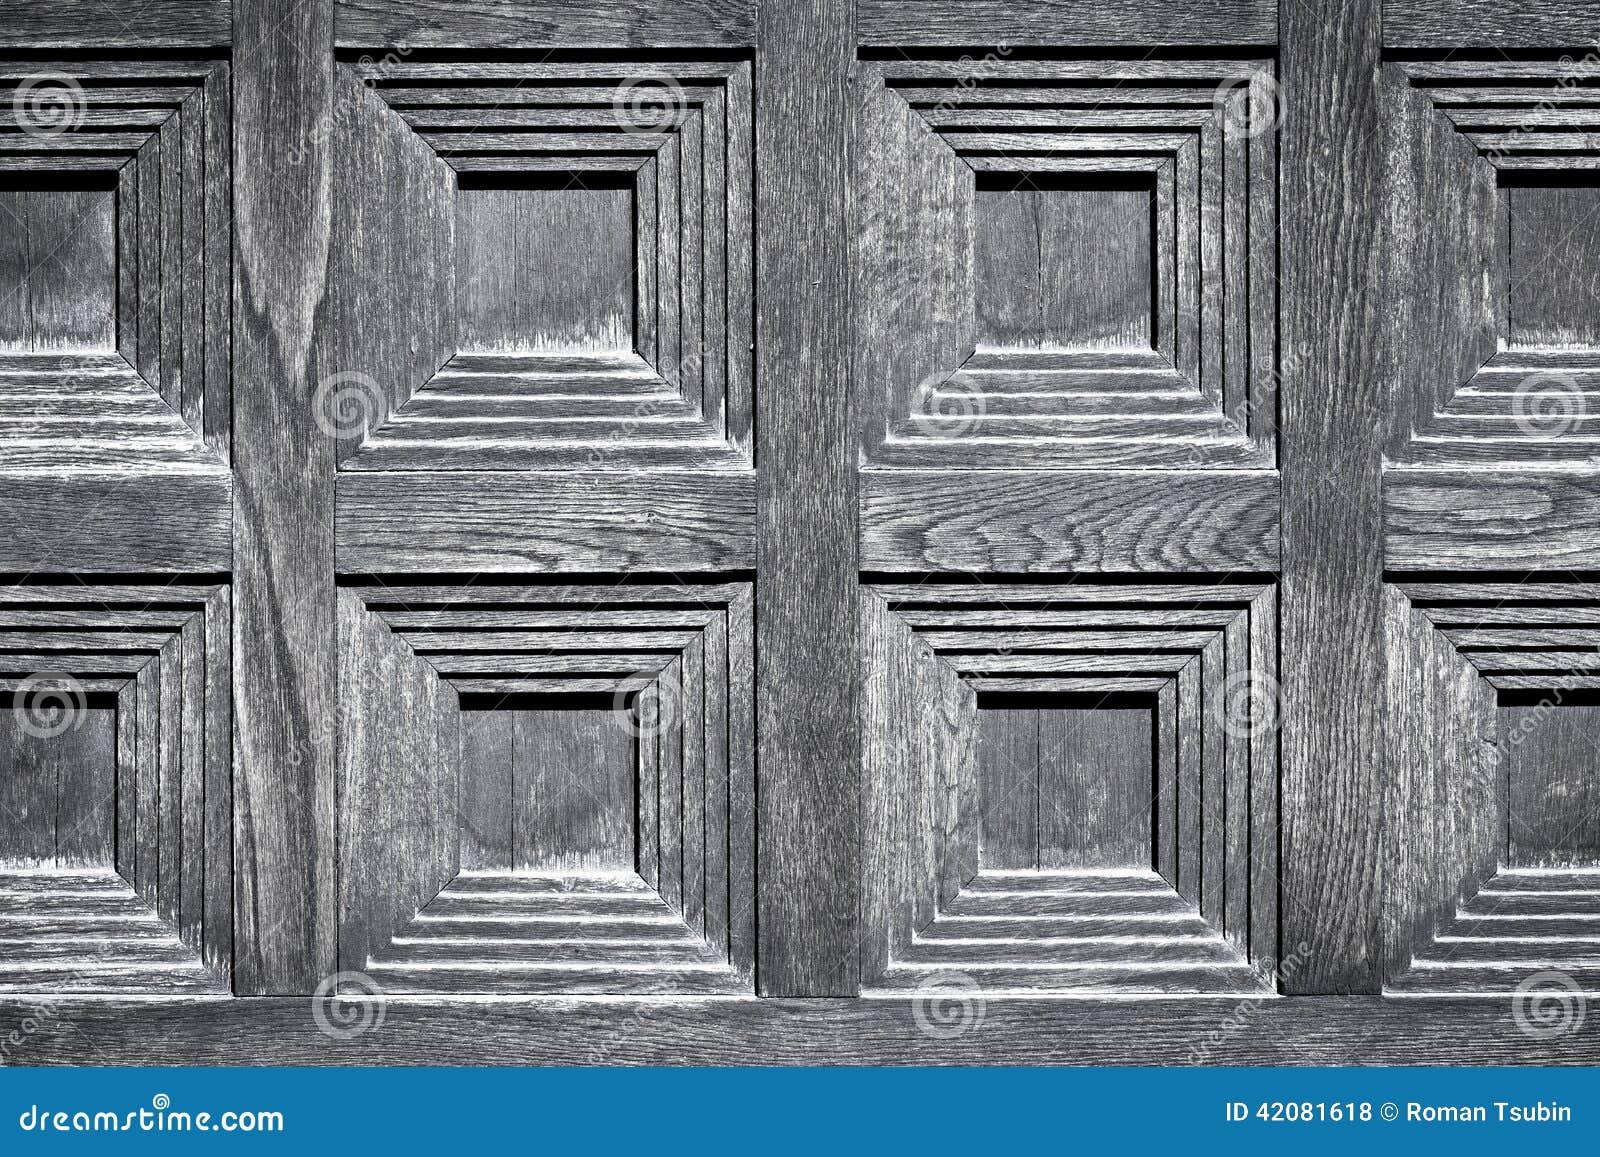 image en gros plan d 39 une porte en bois photo stock image. Black Bedroom Furniture Sets. Home Design Ideas